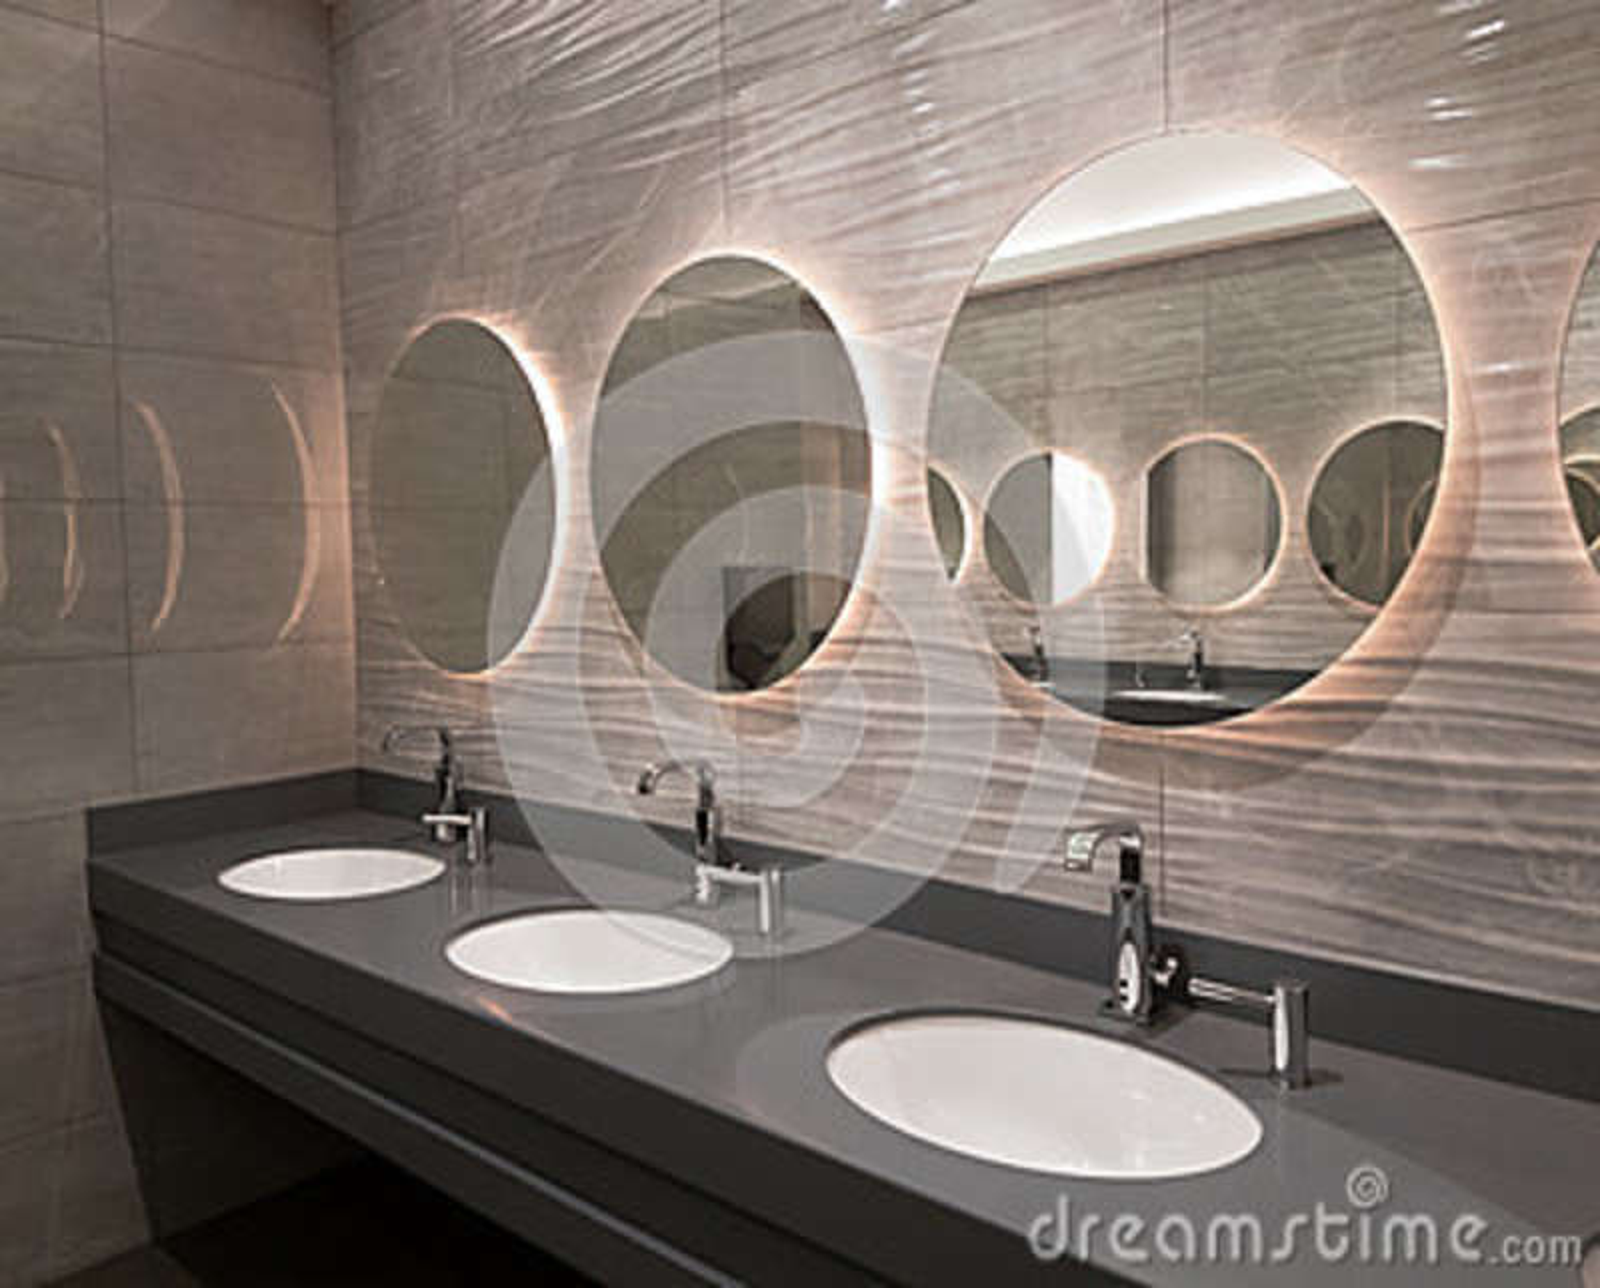 modern public washroom interior stock image image of toilet rh dreamstime com  washroom interior design ideas